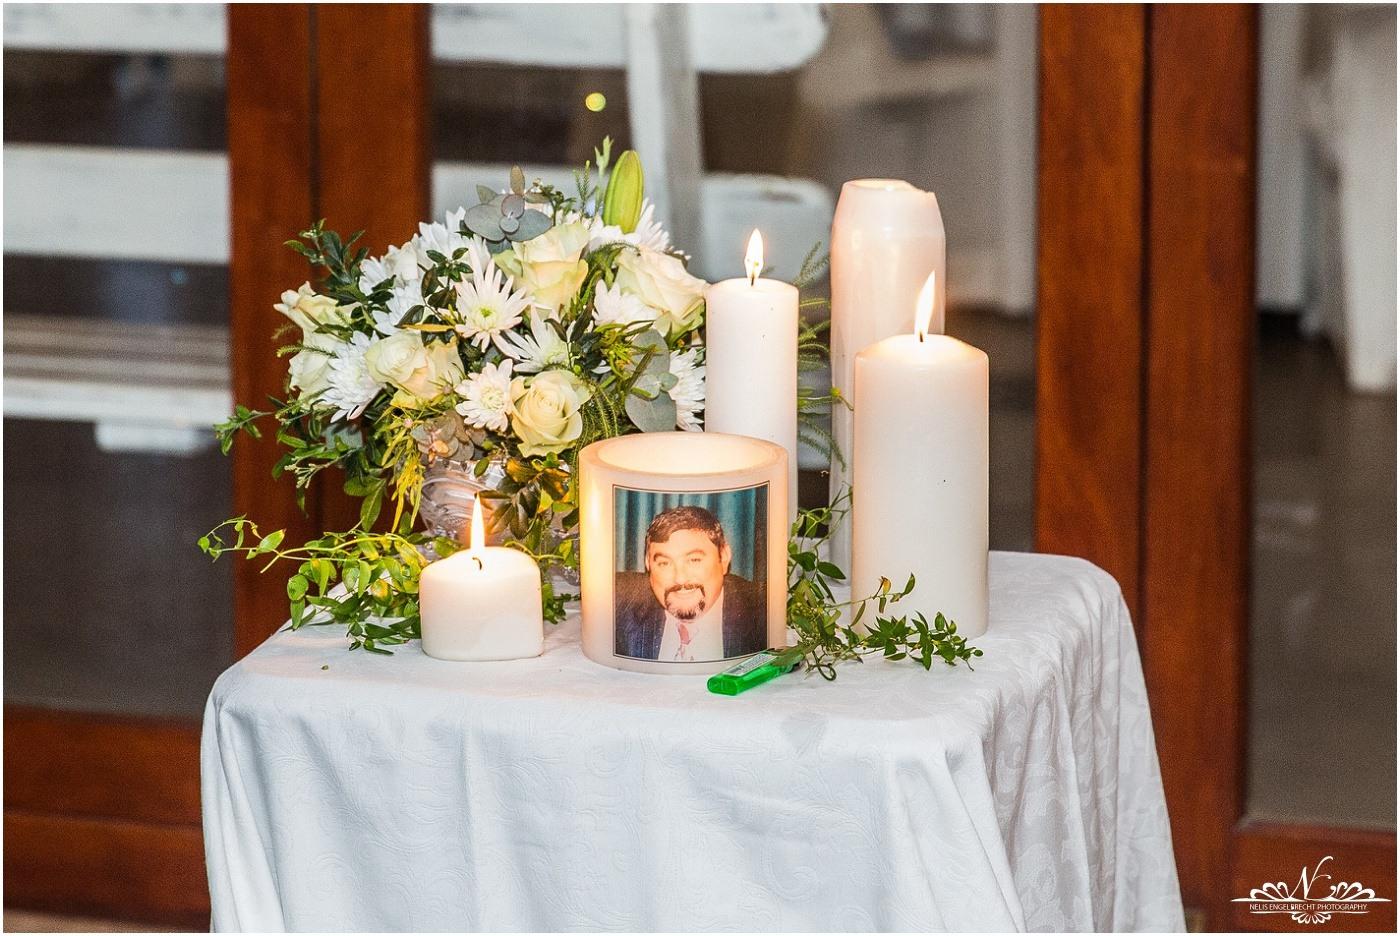 Eensgezind-Wedding-Photos-Nelis-Engelbrecht-Photography-172